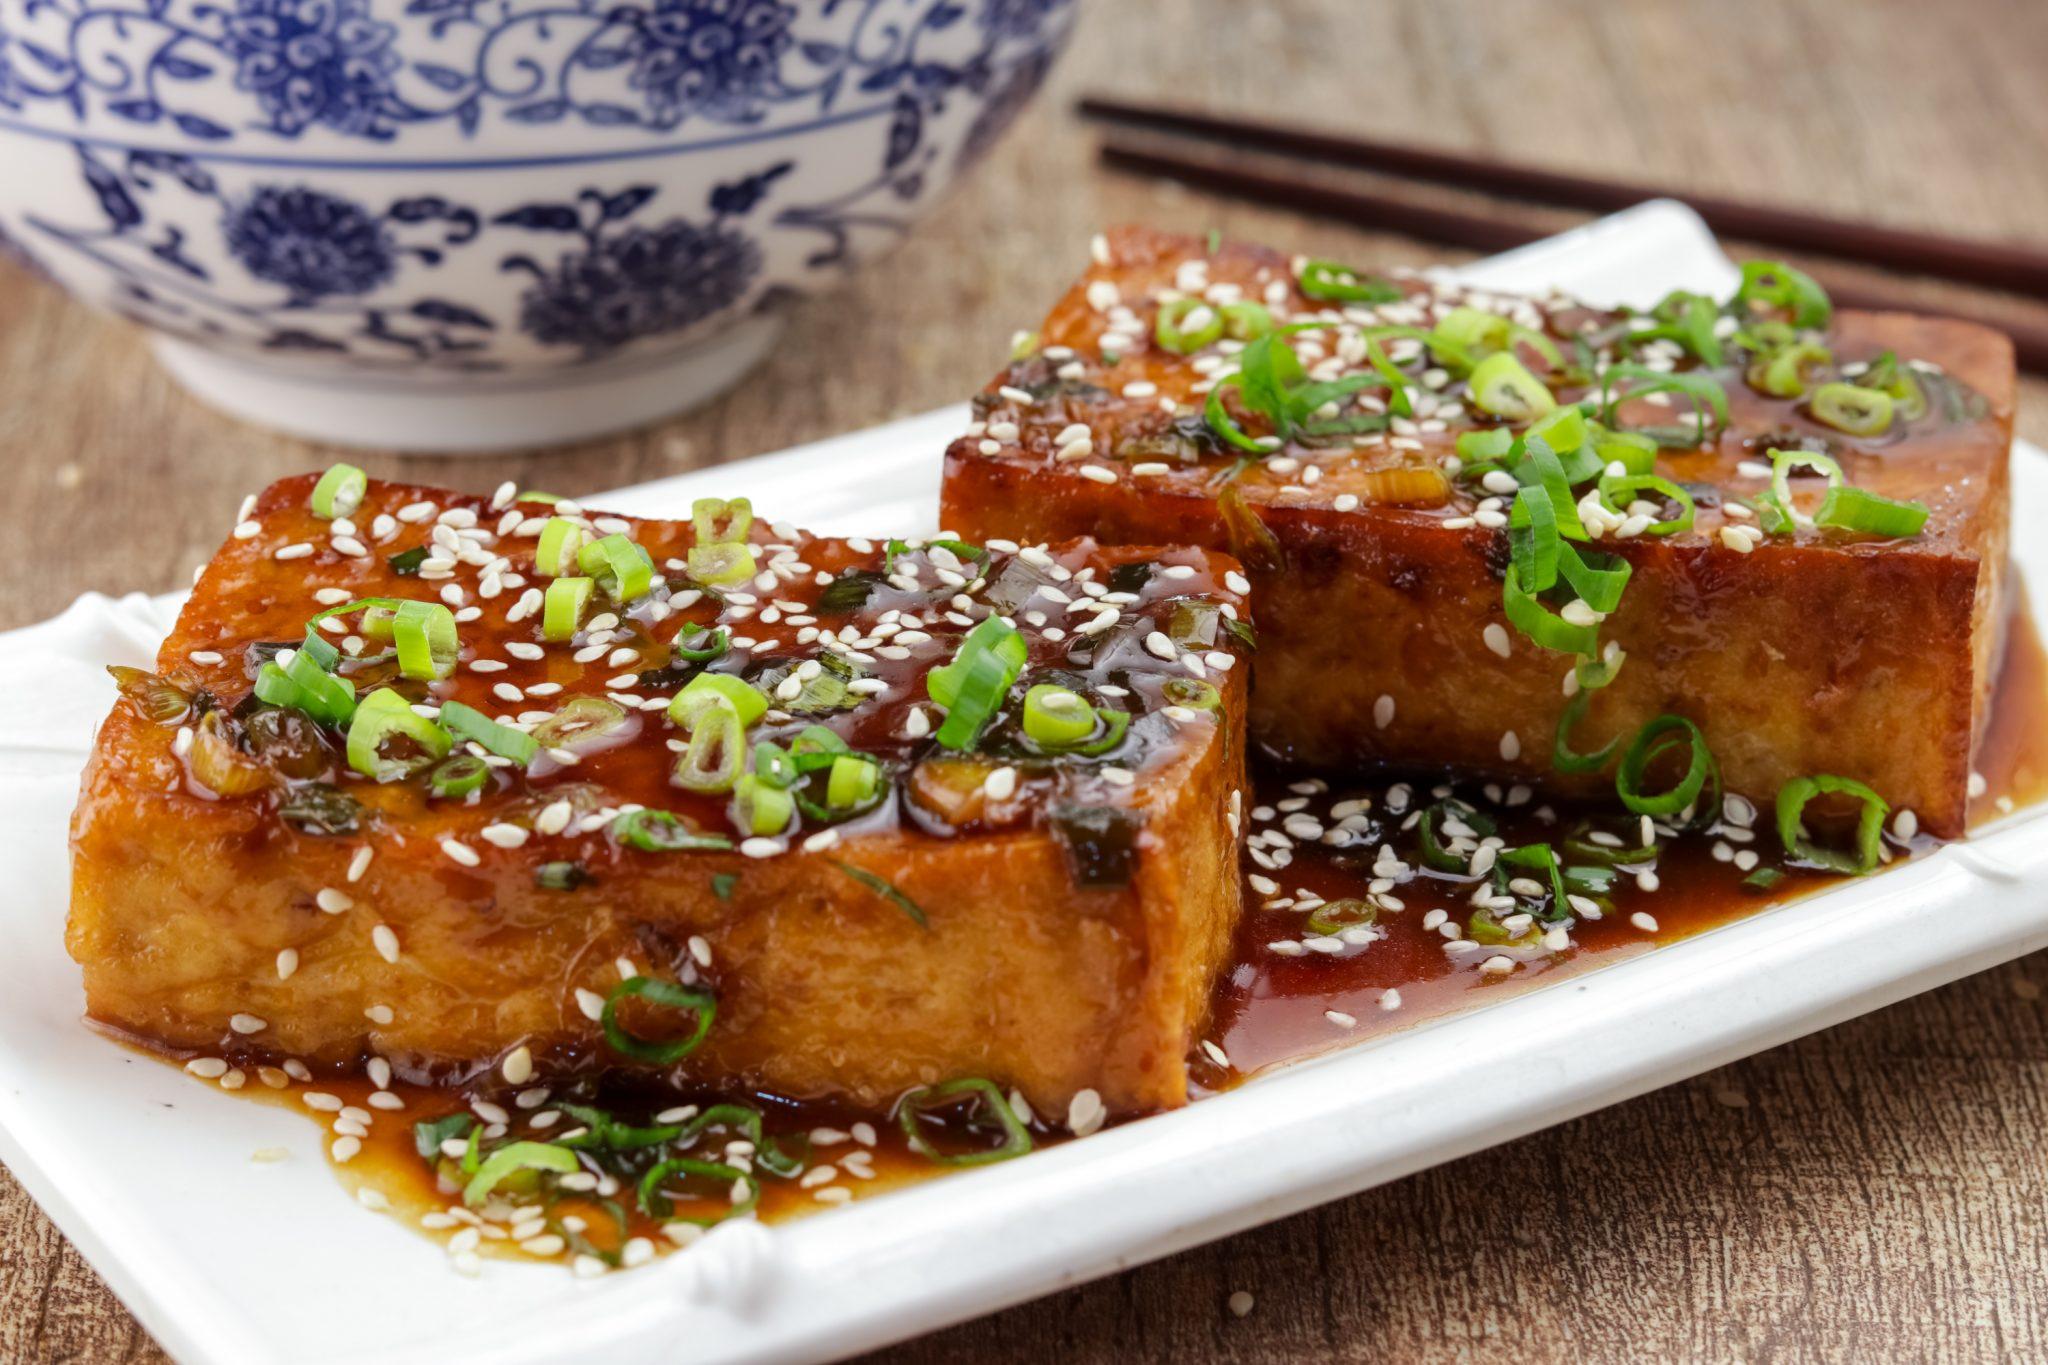 keto recipes: Teriyaki Tofu Steaks